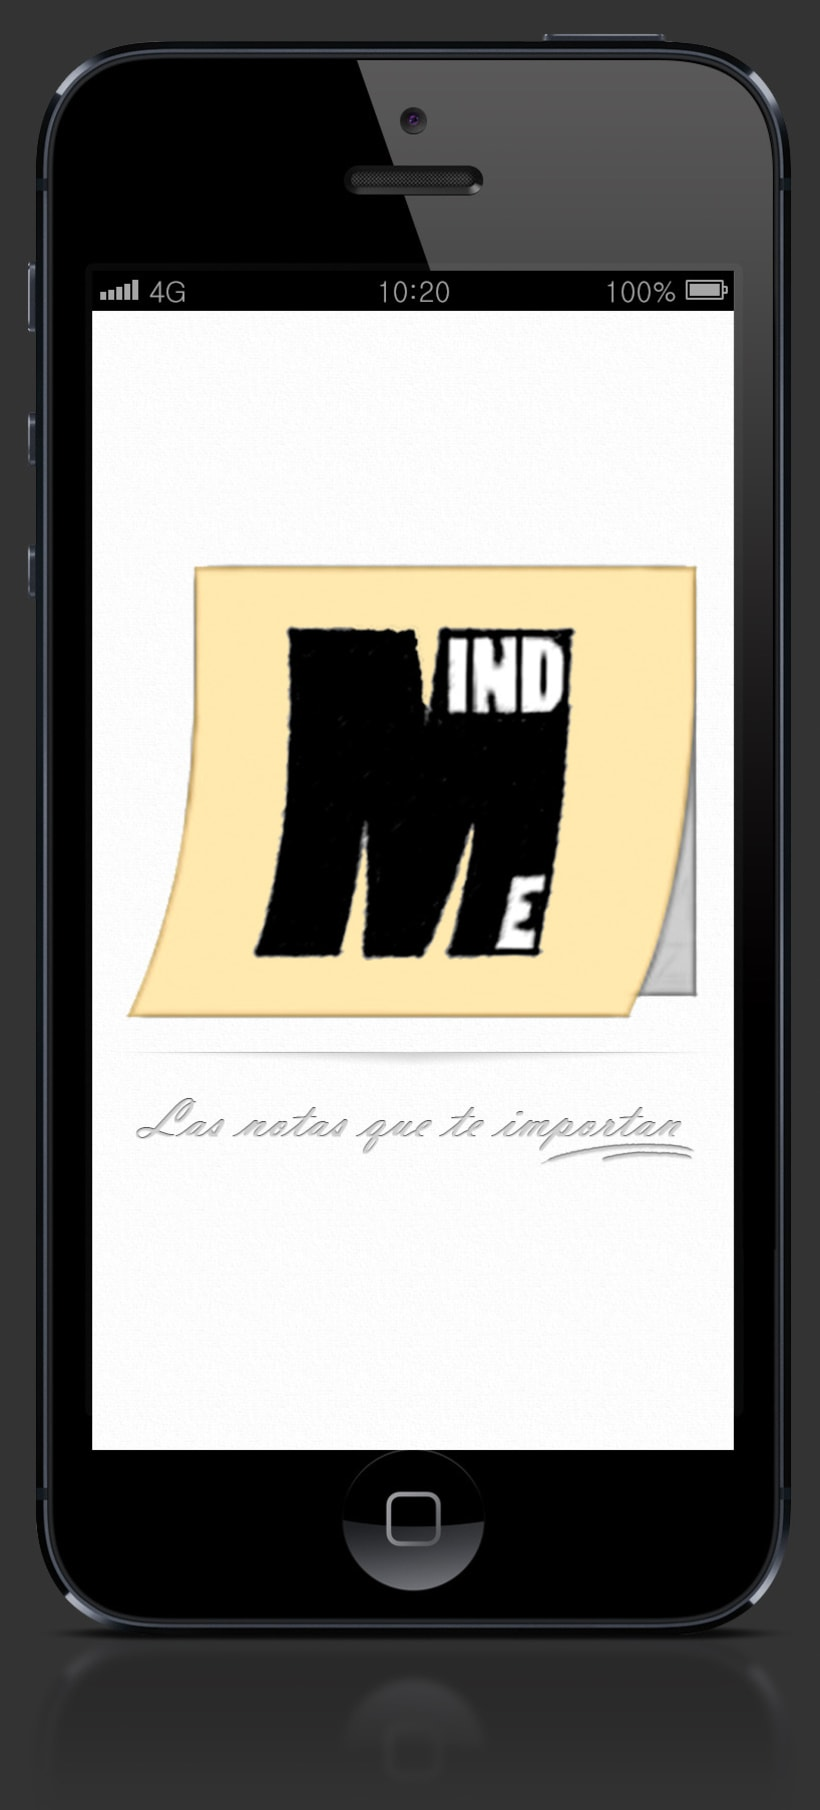 Apps Iphone y Ipad 19